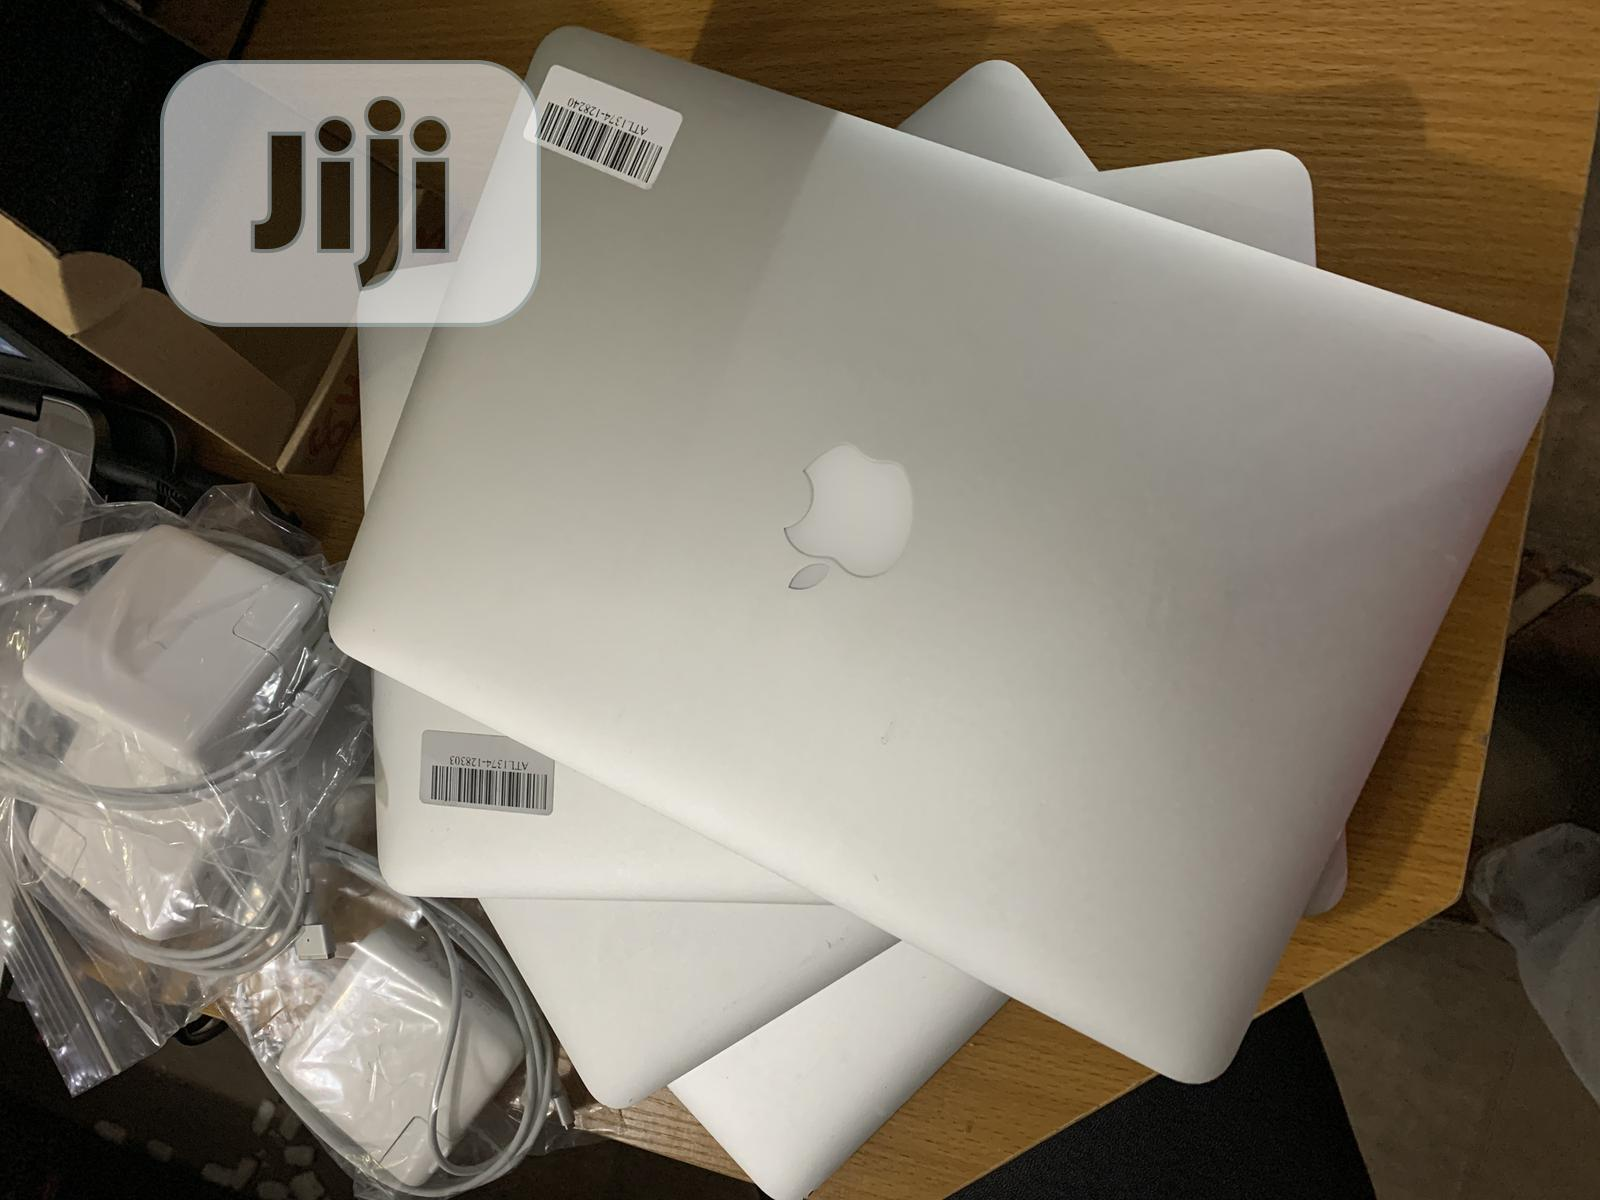 Laptop Apple MacBook Pro 8GB Intel Core i5 SSD 128GB | Laptops & Computers for sale in Ikeja, Lagos State, Nigeria